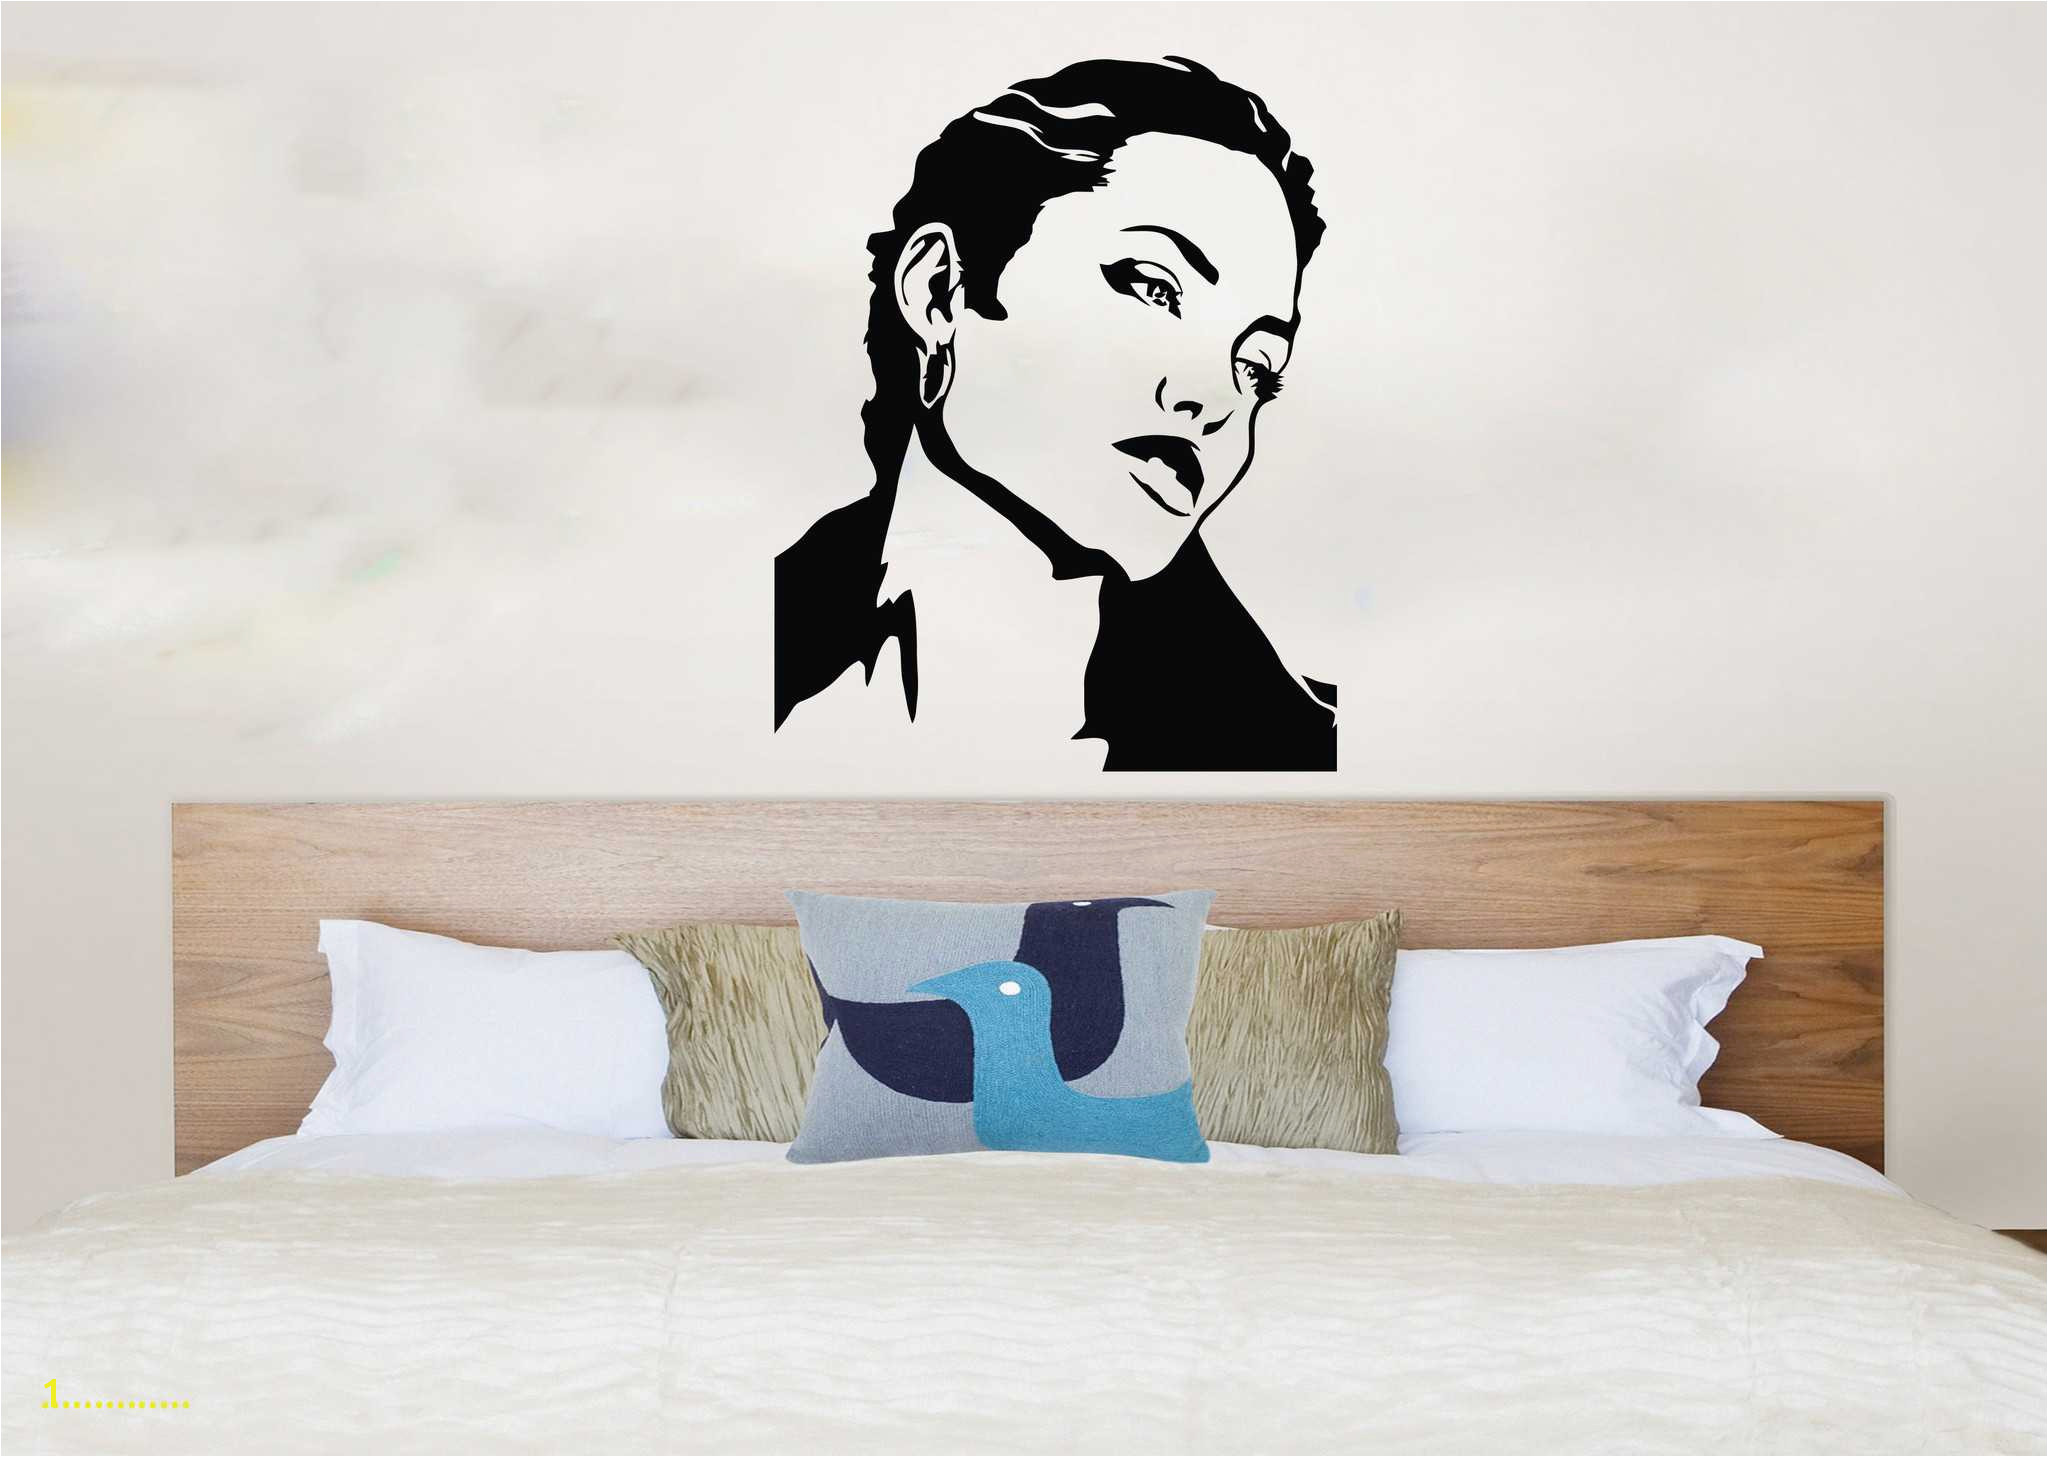 Wall Decals for Bedroom Unique 1 Kirkland Wall Decor Home Design 0d Inspiration Boys Room